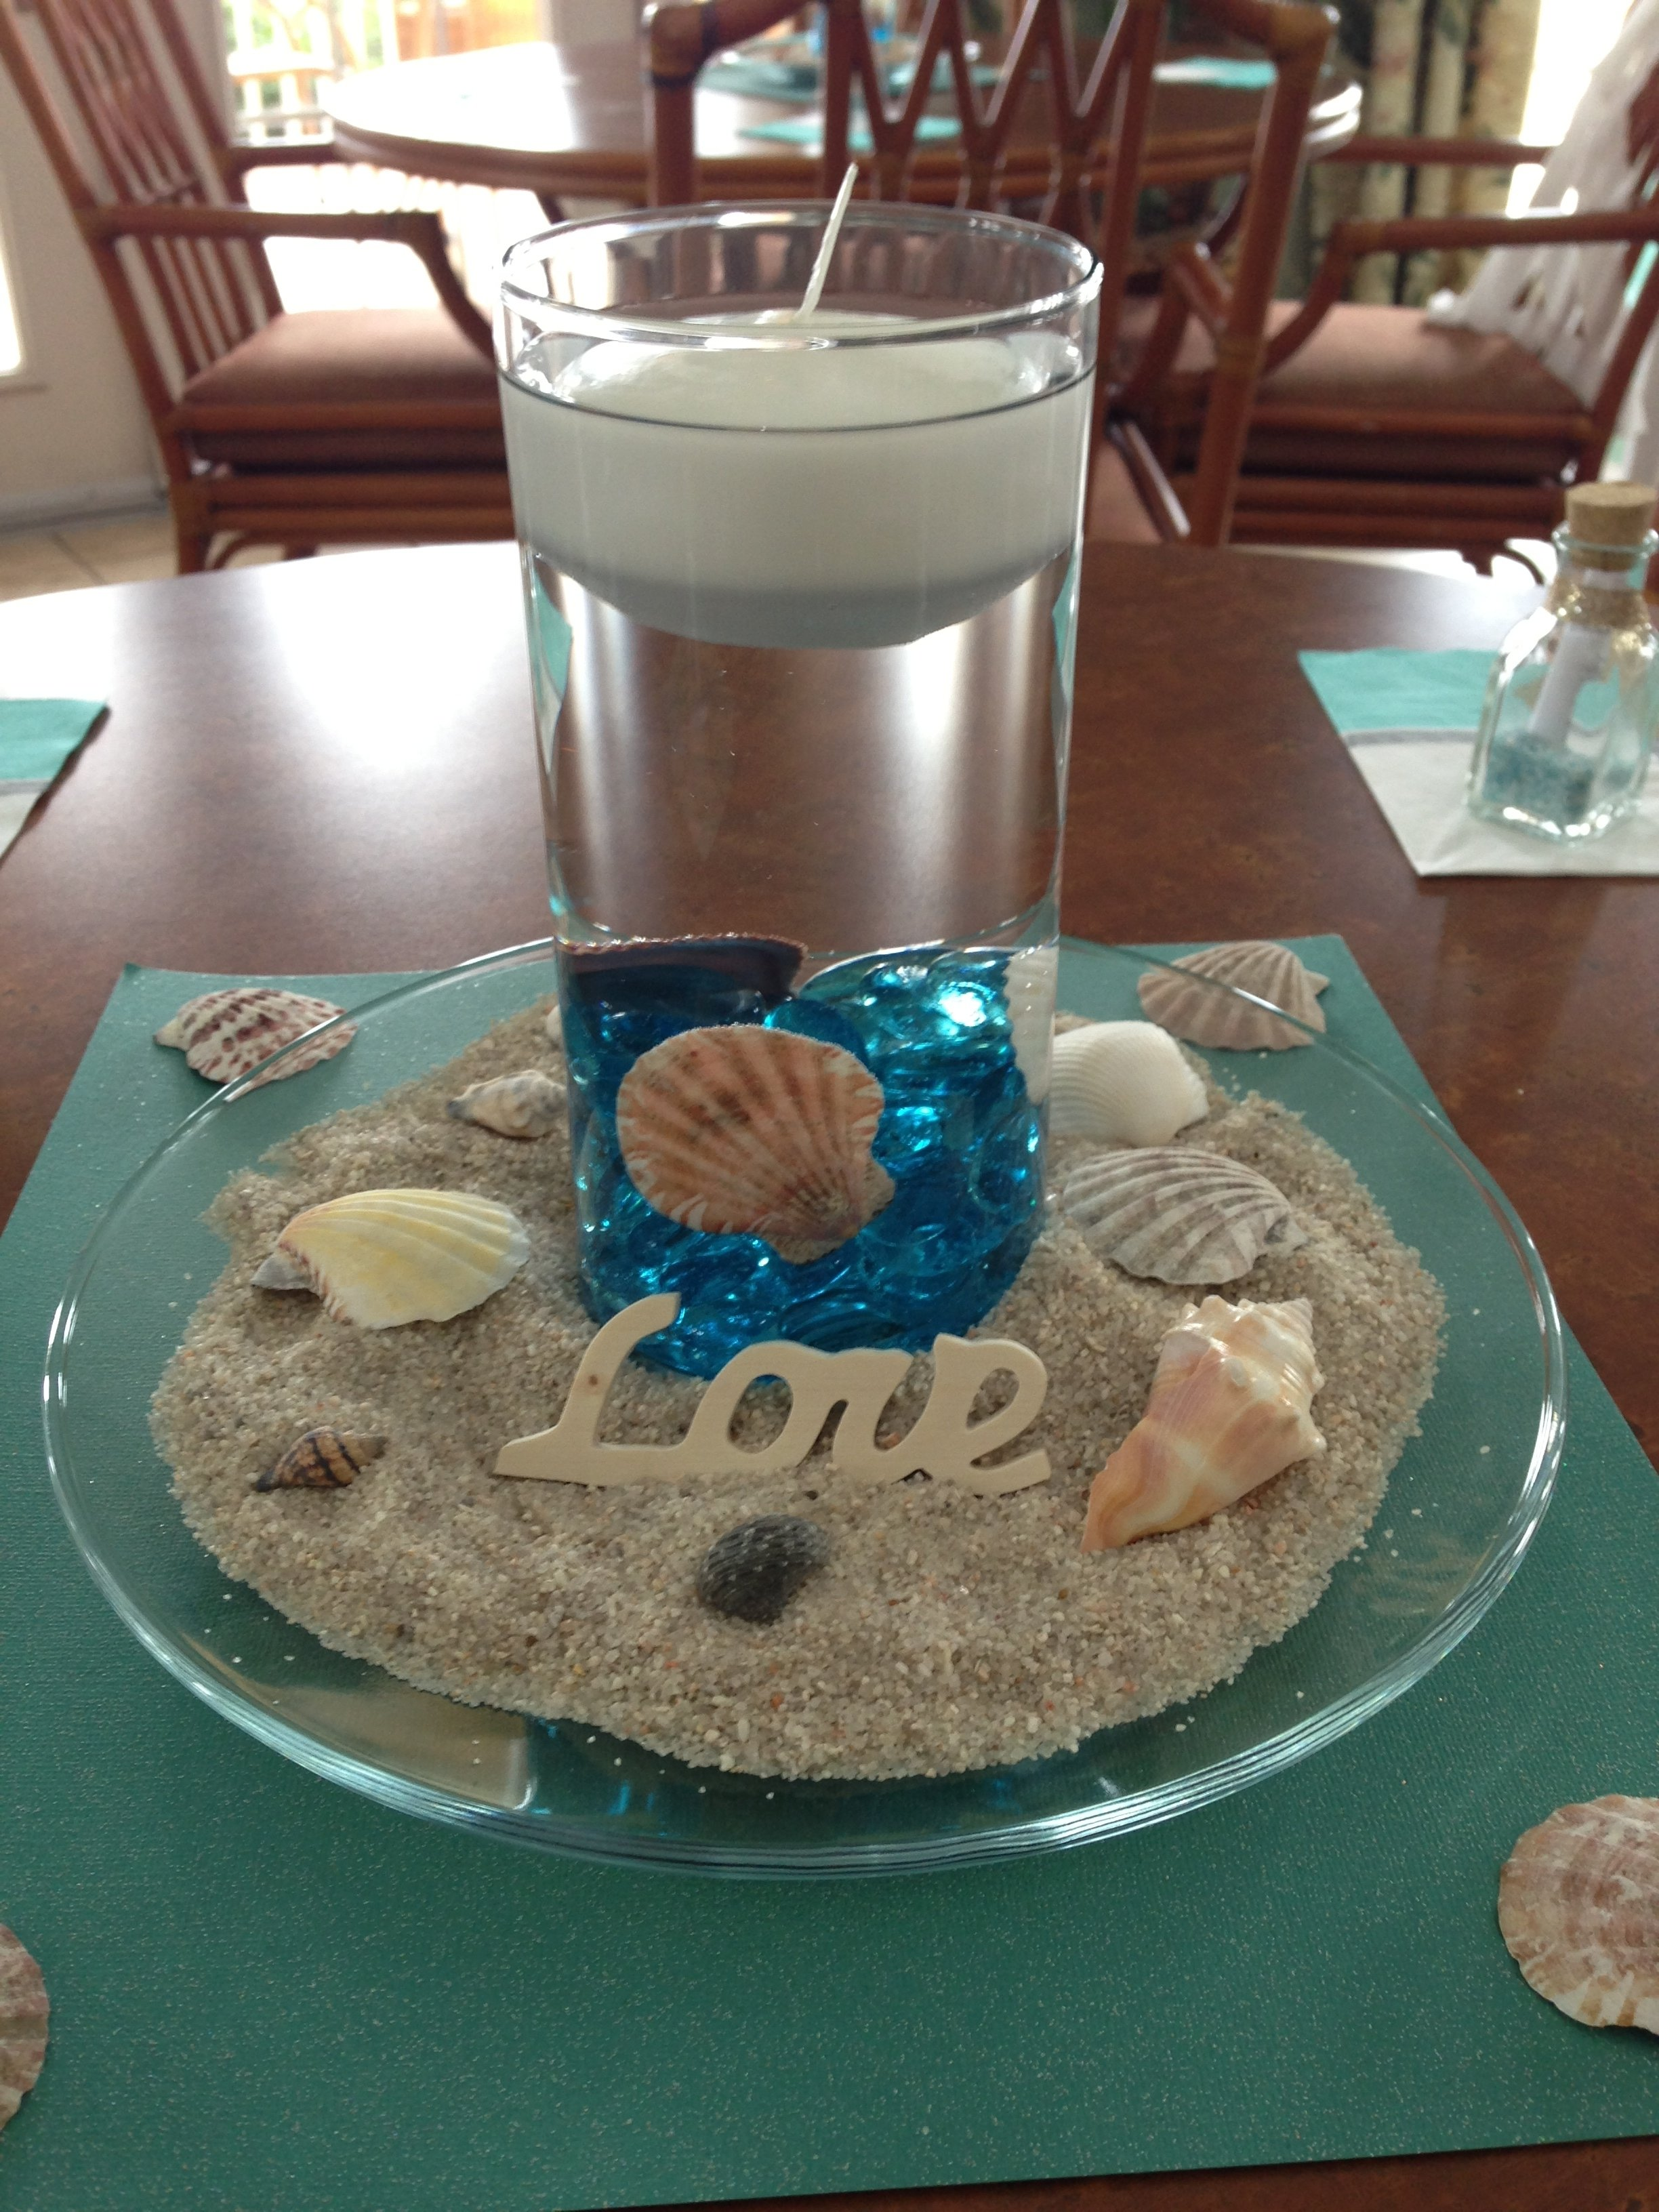 10 Most Popular Beach Themed Bridal Shower Ideas ideas baby shower for beach theme favors awful decoration 2020